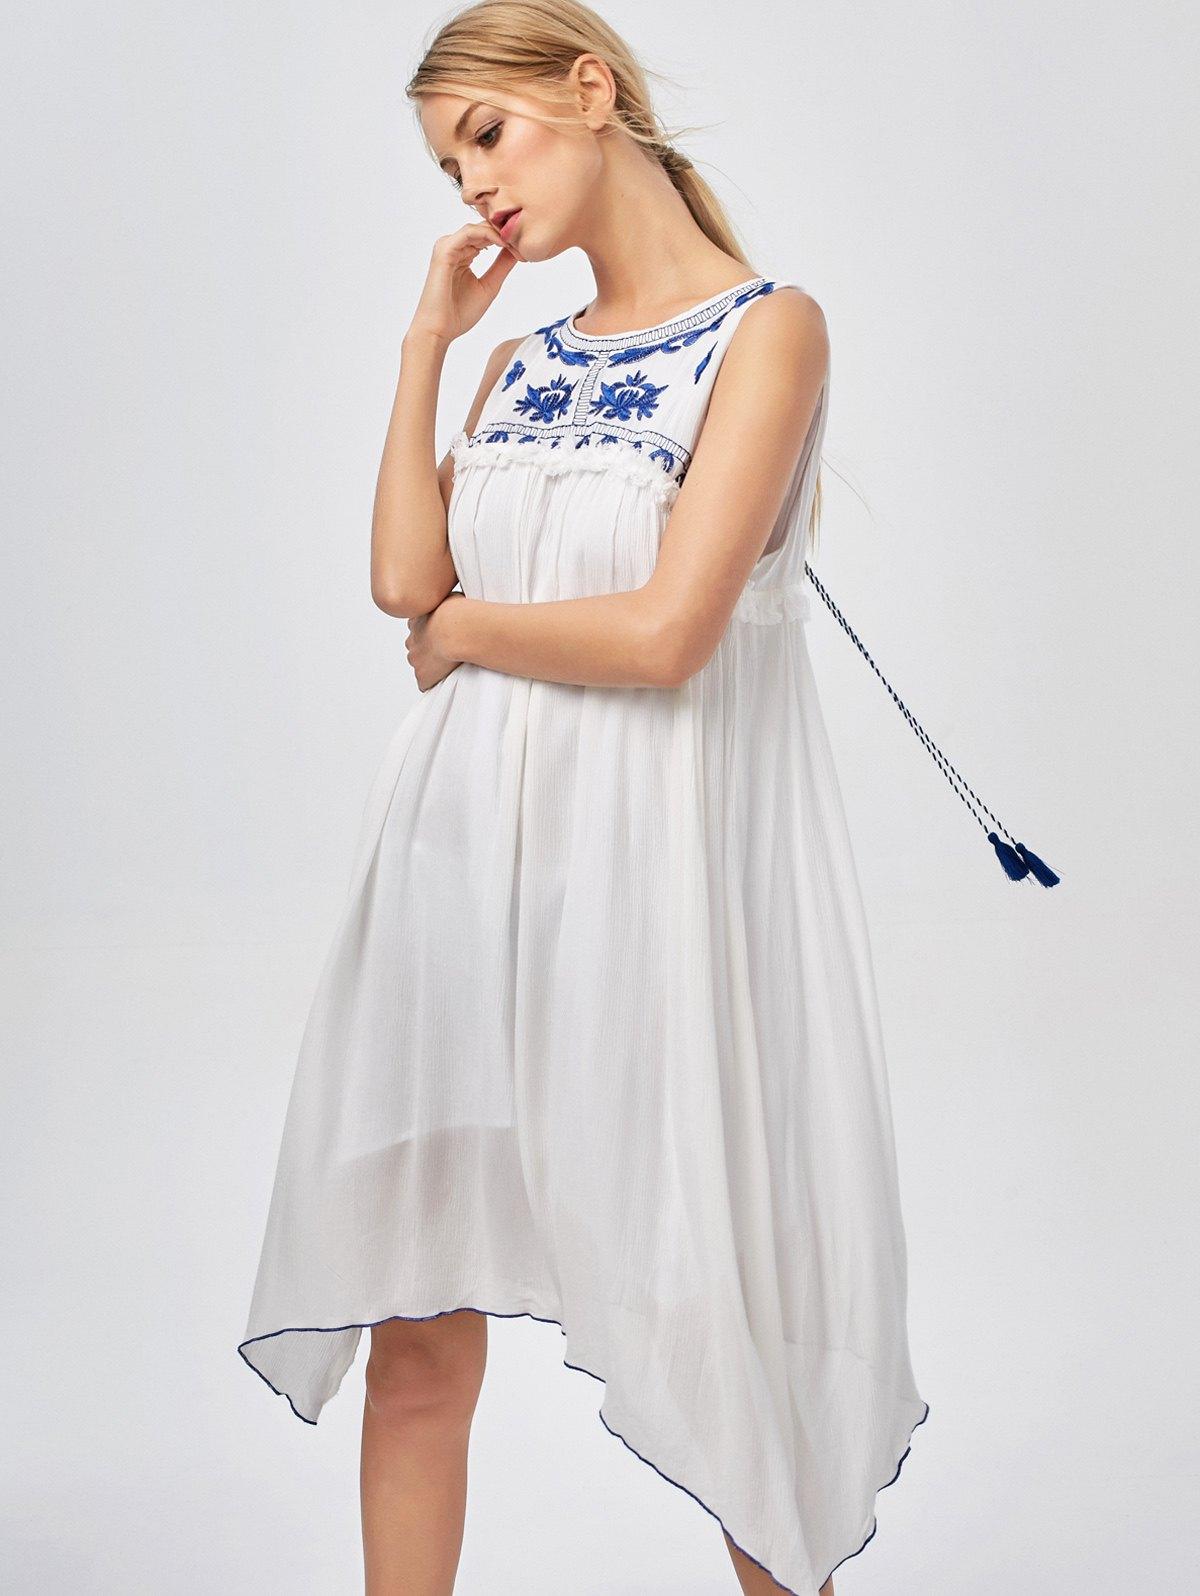 Bohemian Dresses  White And Long Bohemian Dresses For Women ...